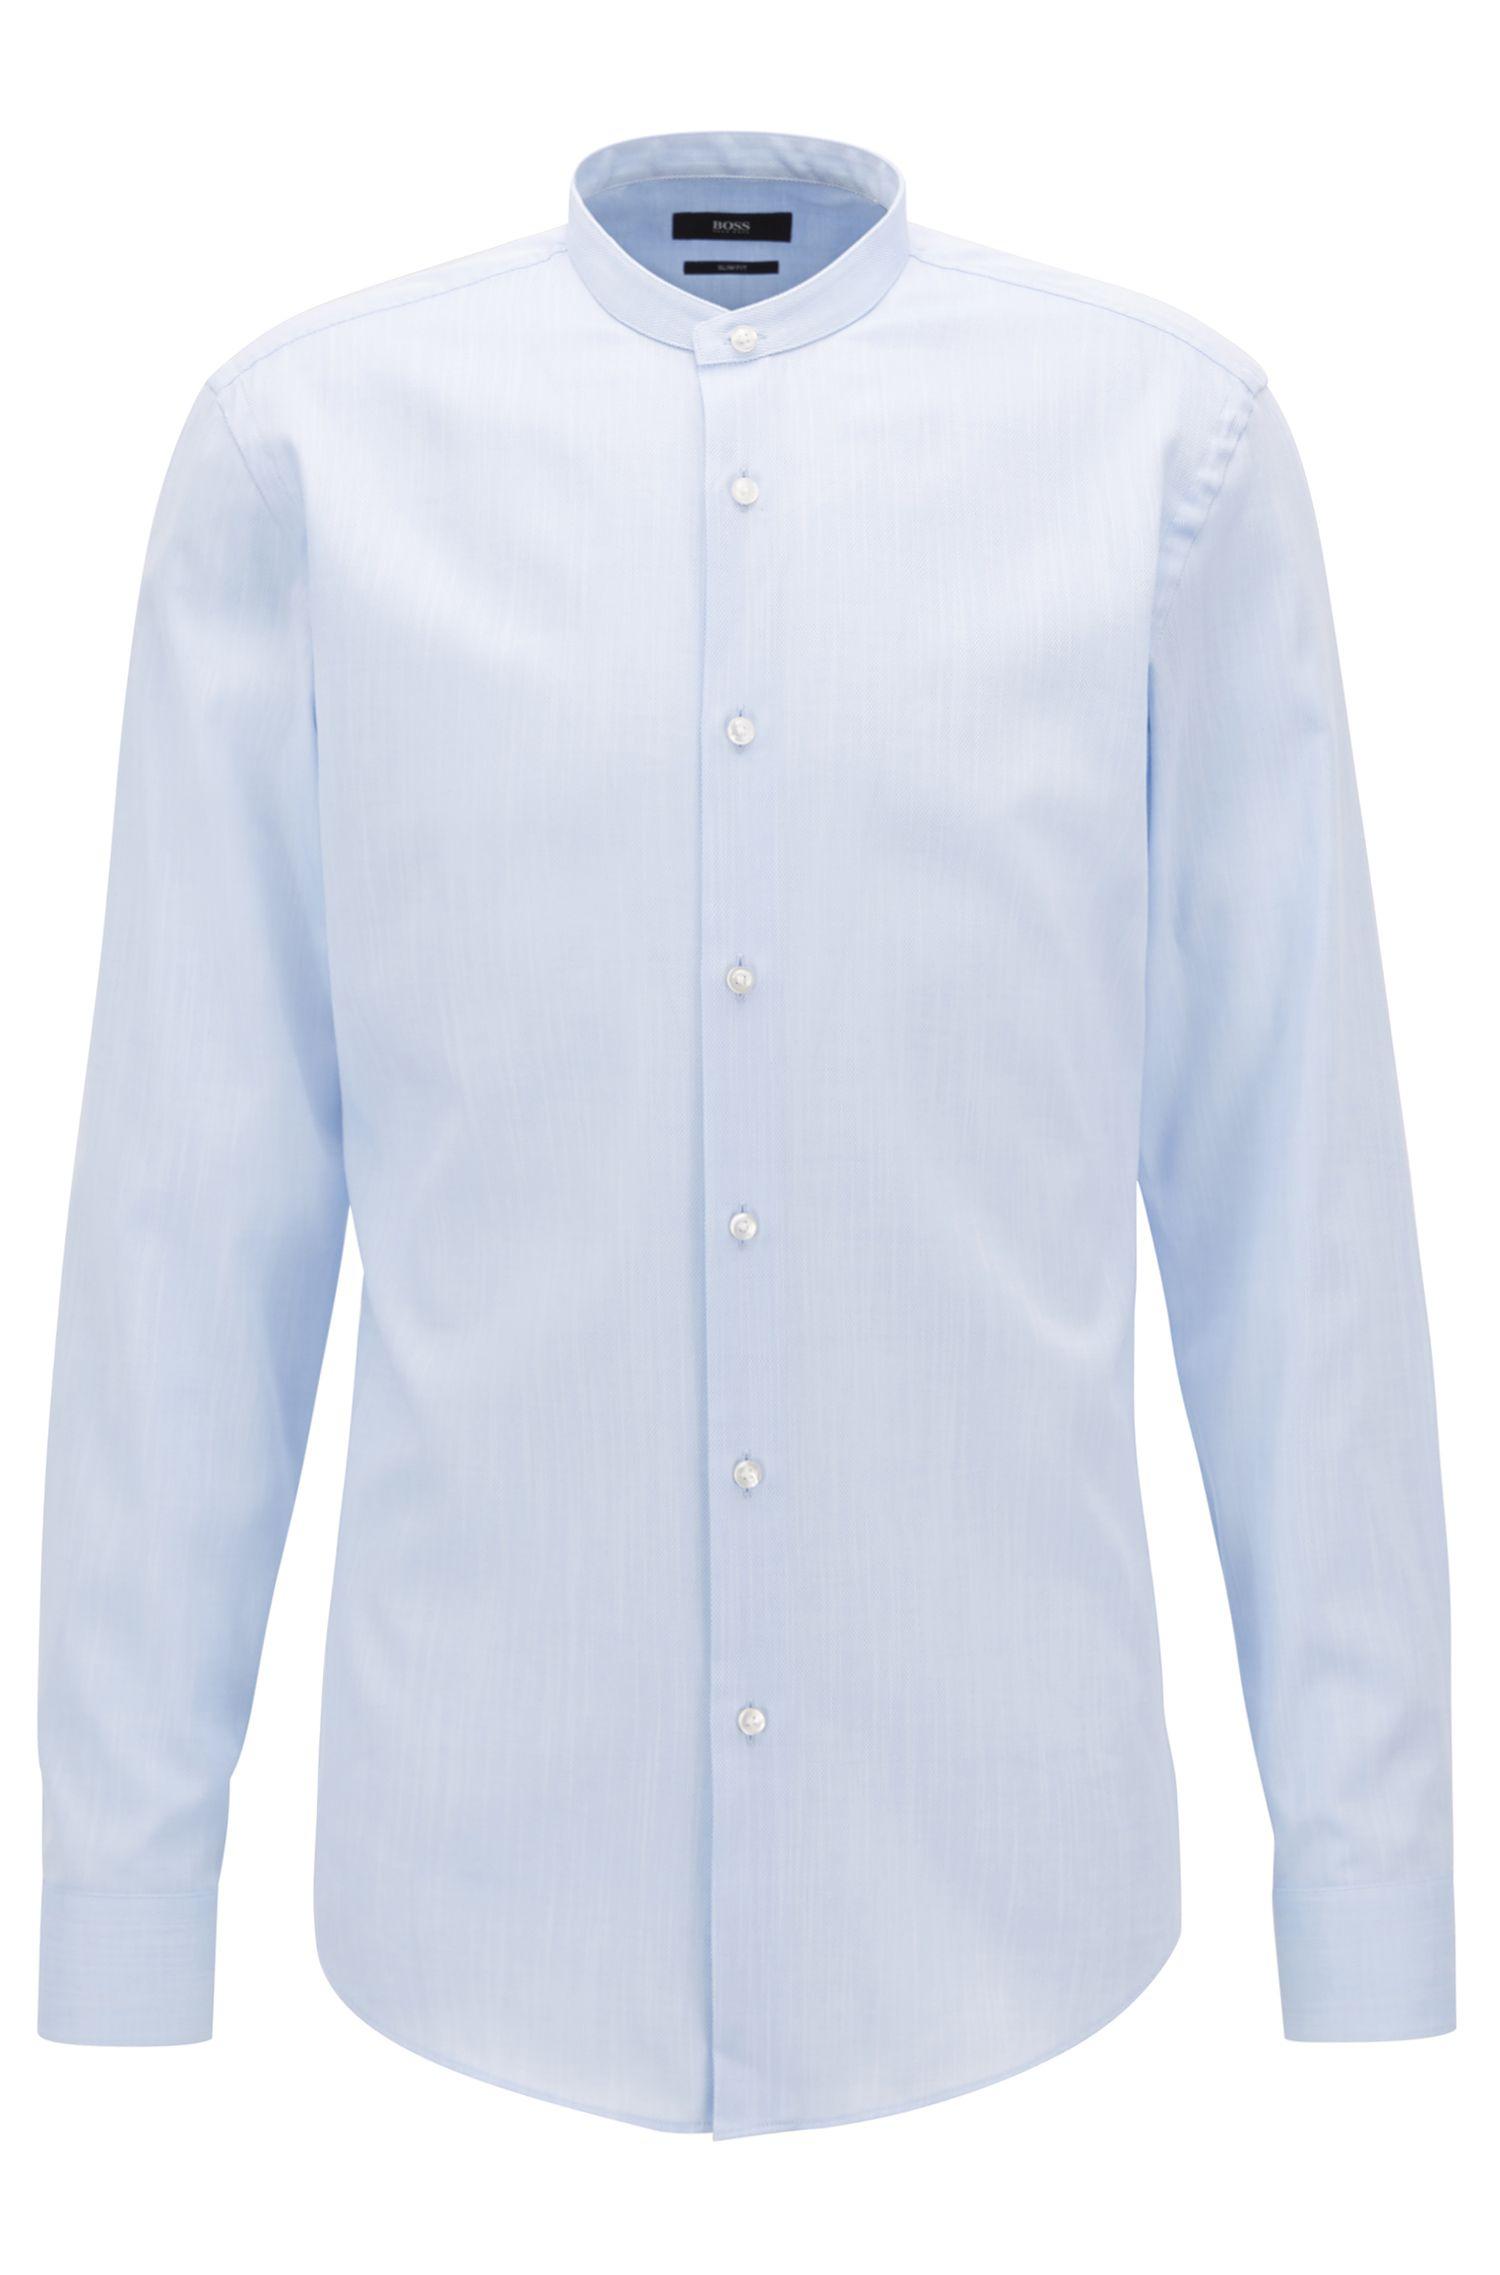 Cotton Dress Shirt, Slim Fit | Jordi, Light Blue